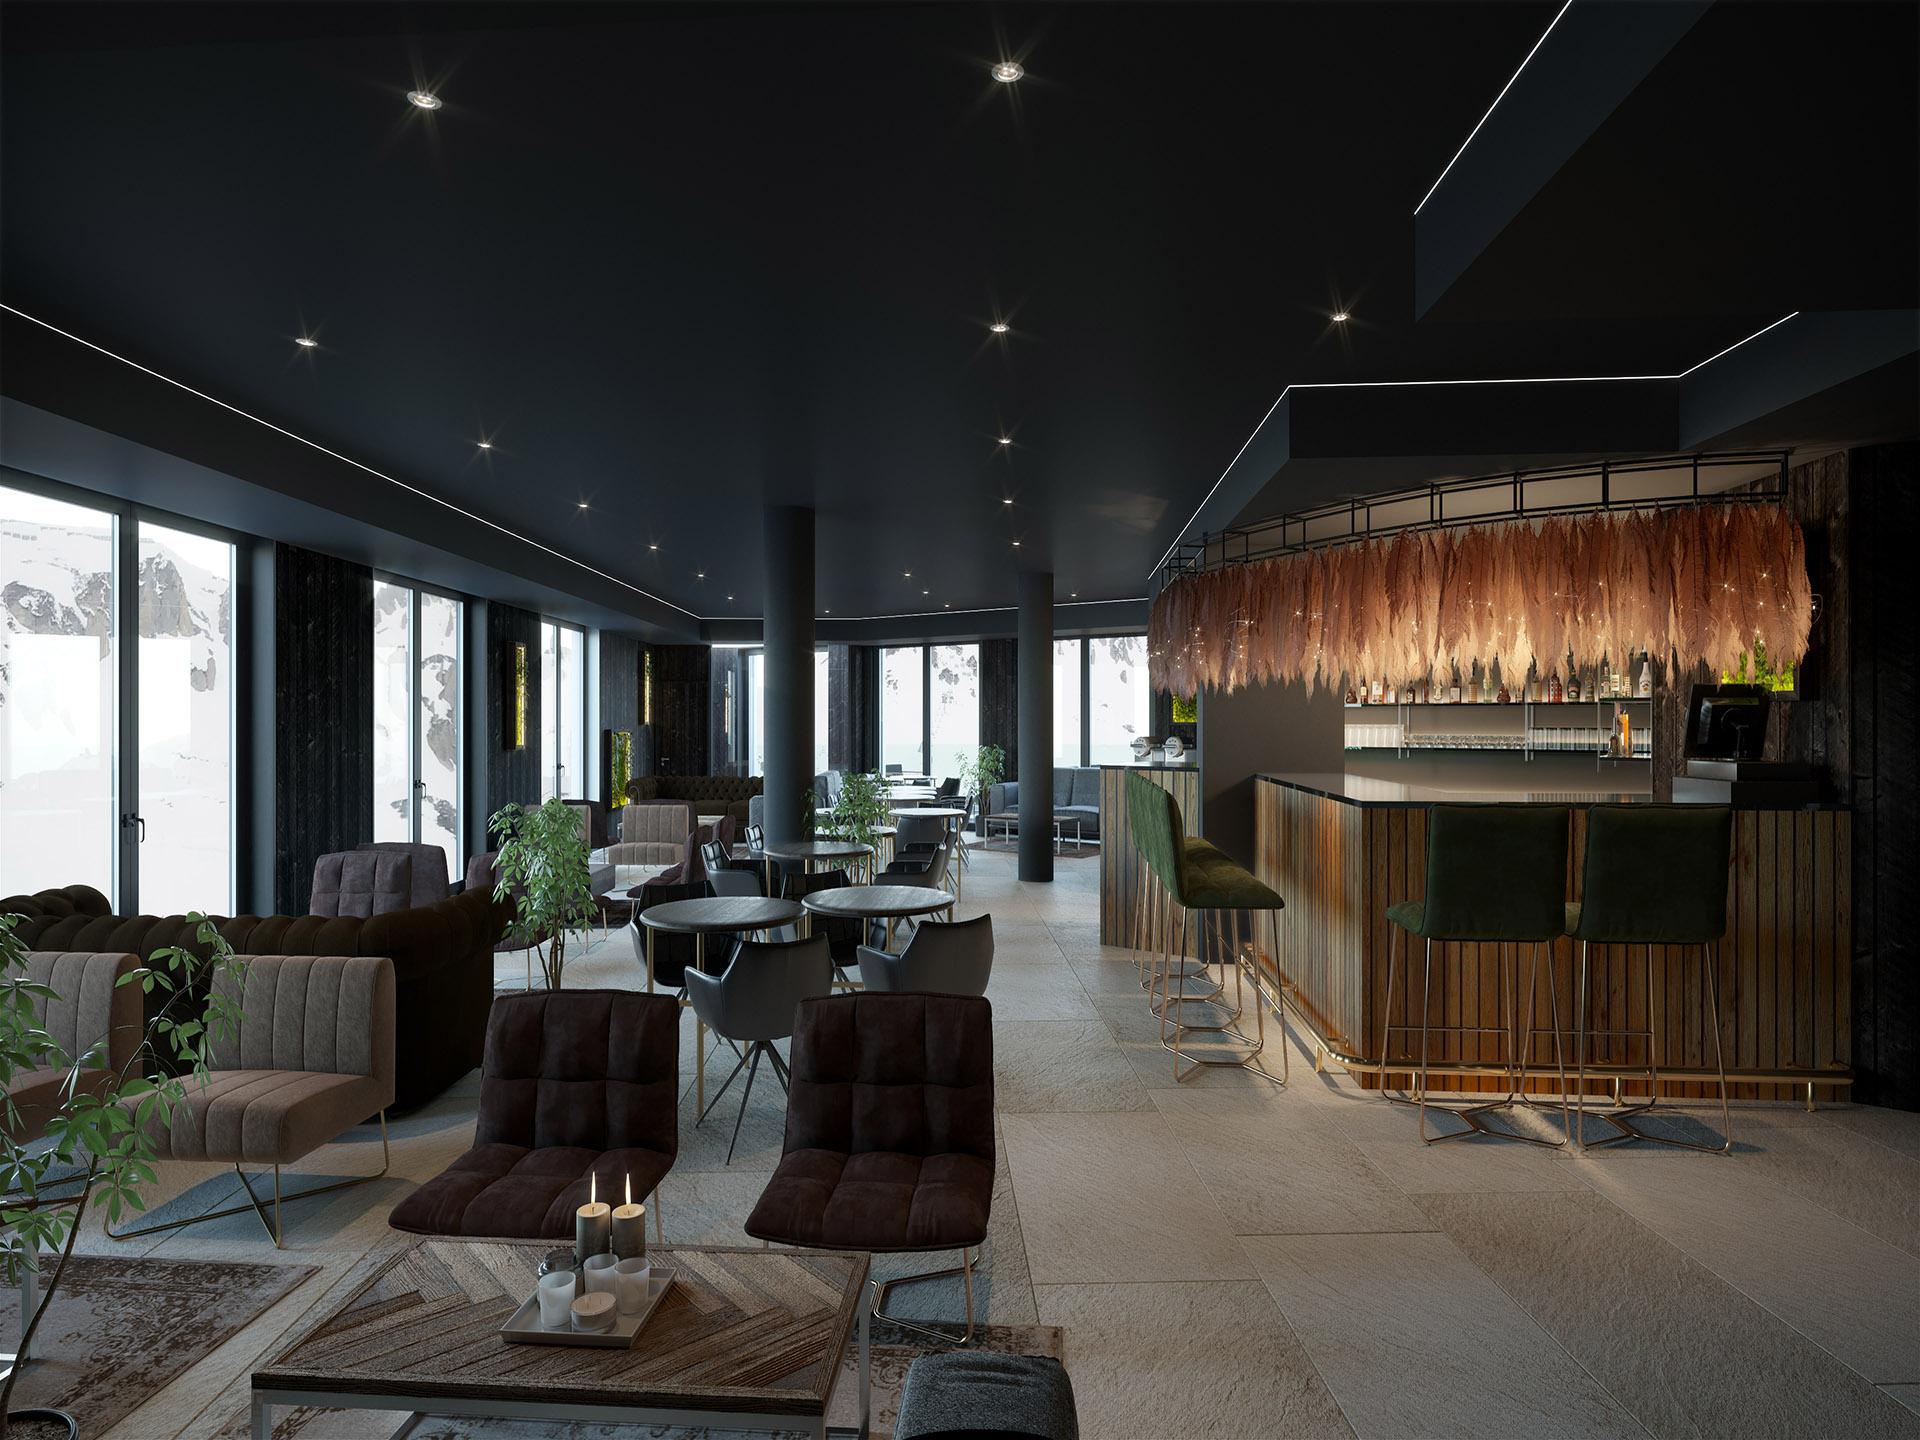 3D visualization of a high-end bar restaurant